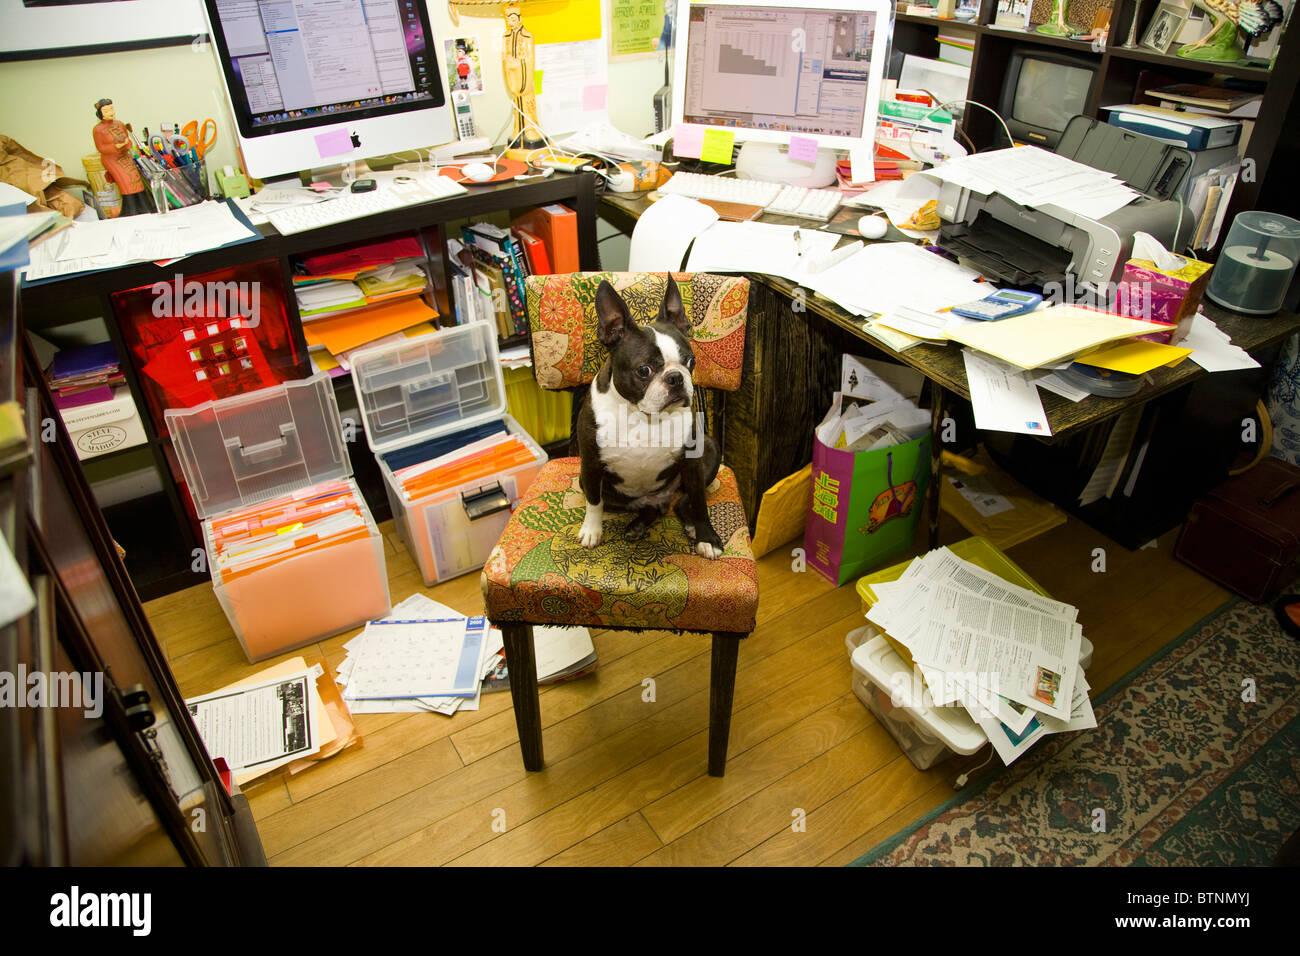 Boston terrier sitting at messy desk - Stock Image